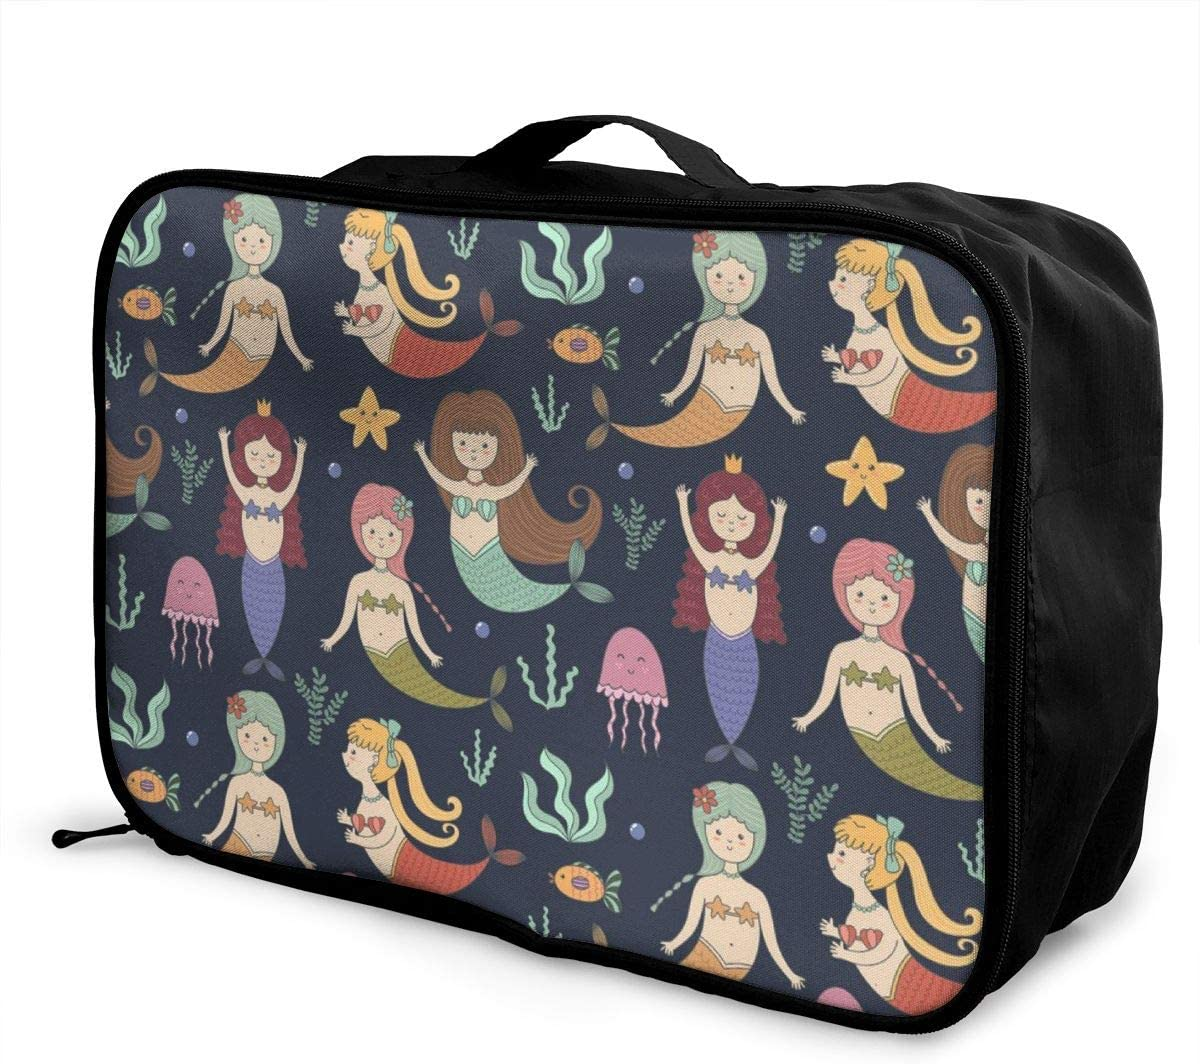 Yunshm Cute Mermaids Seamless Pattern Vector Image Customized Trolley Handbag Waterproof Unisex Large Capacity For Business Travel Storage